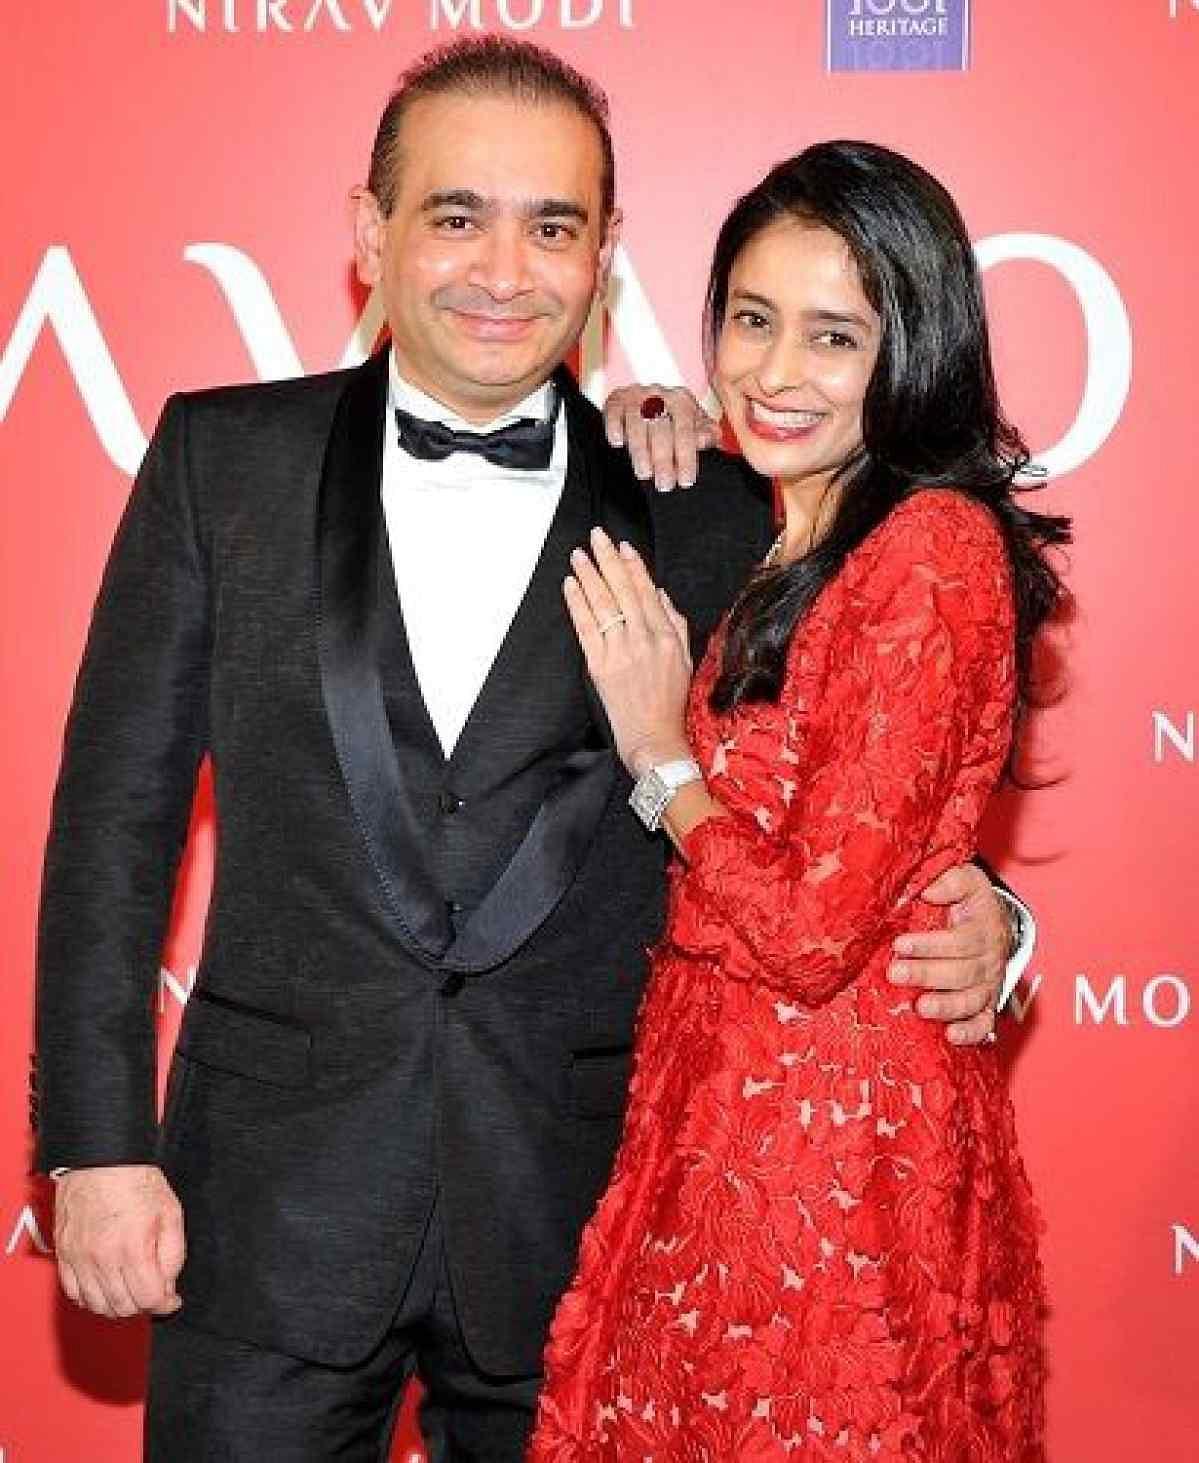 Nirav Modi with his wife Ami Nirav Modi.